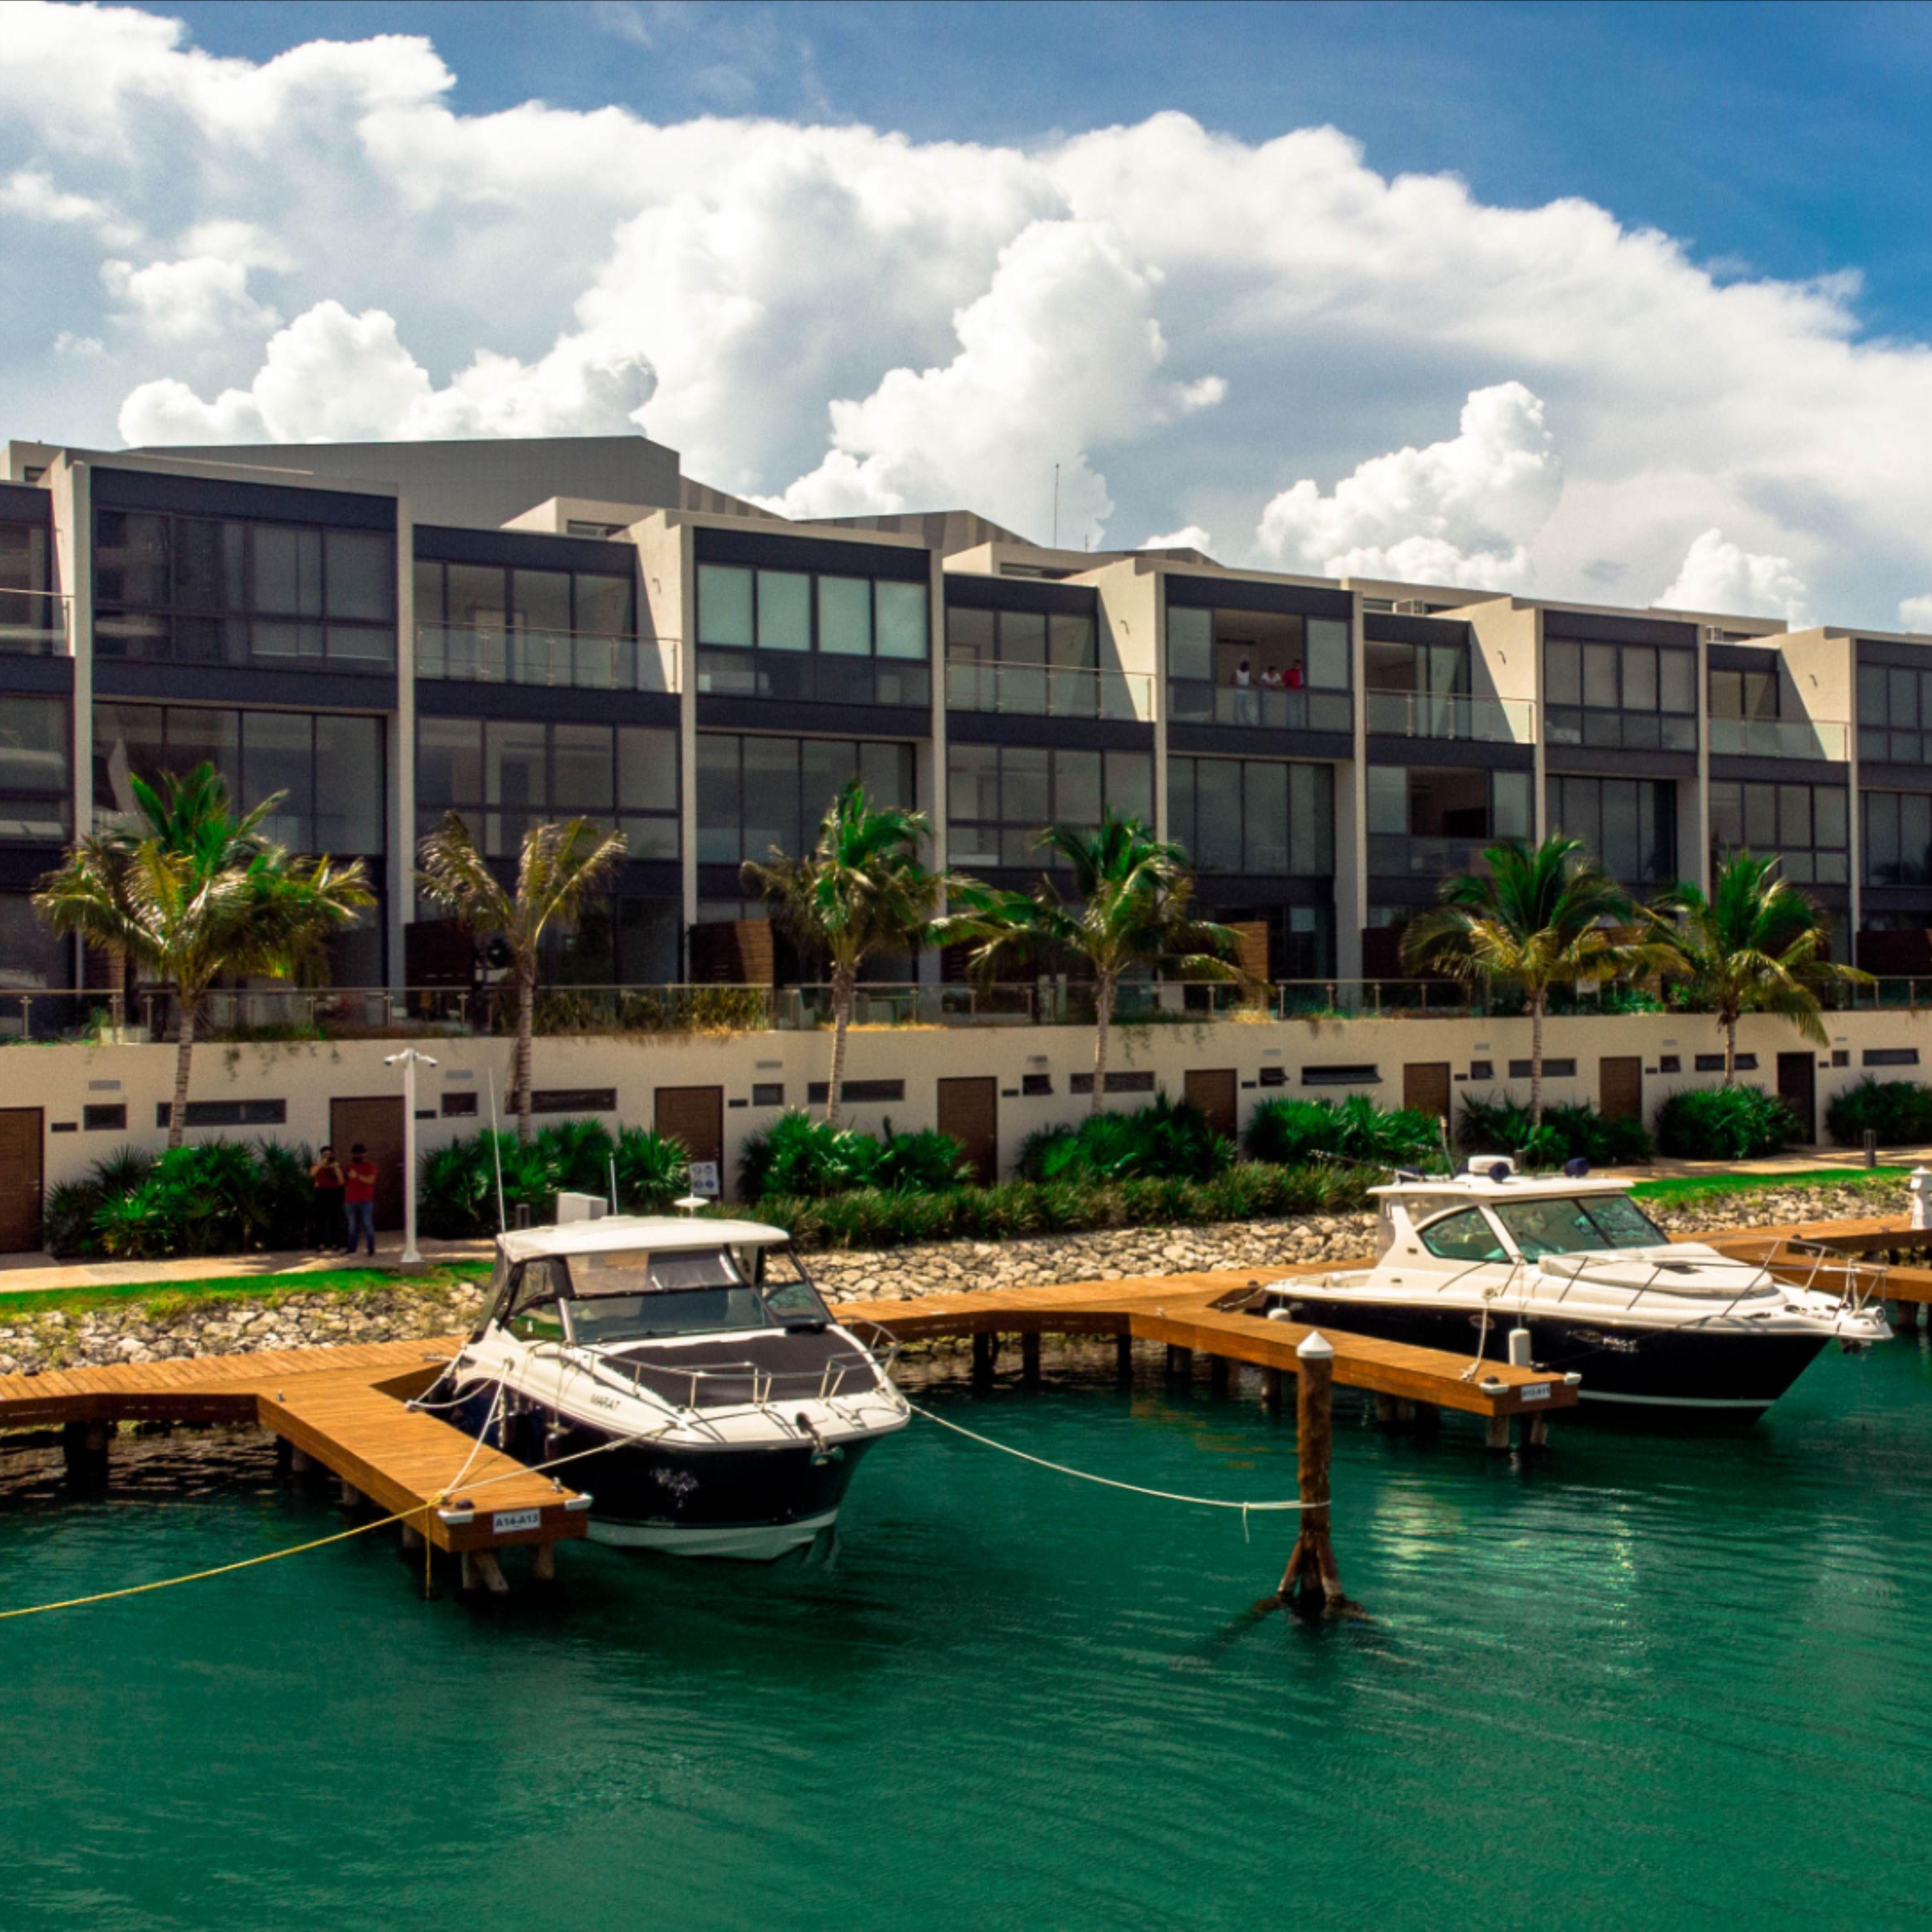 Muelles de clase mundial en la Marina Muelle 7 Cancún.